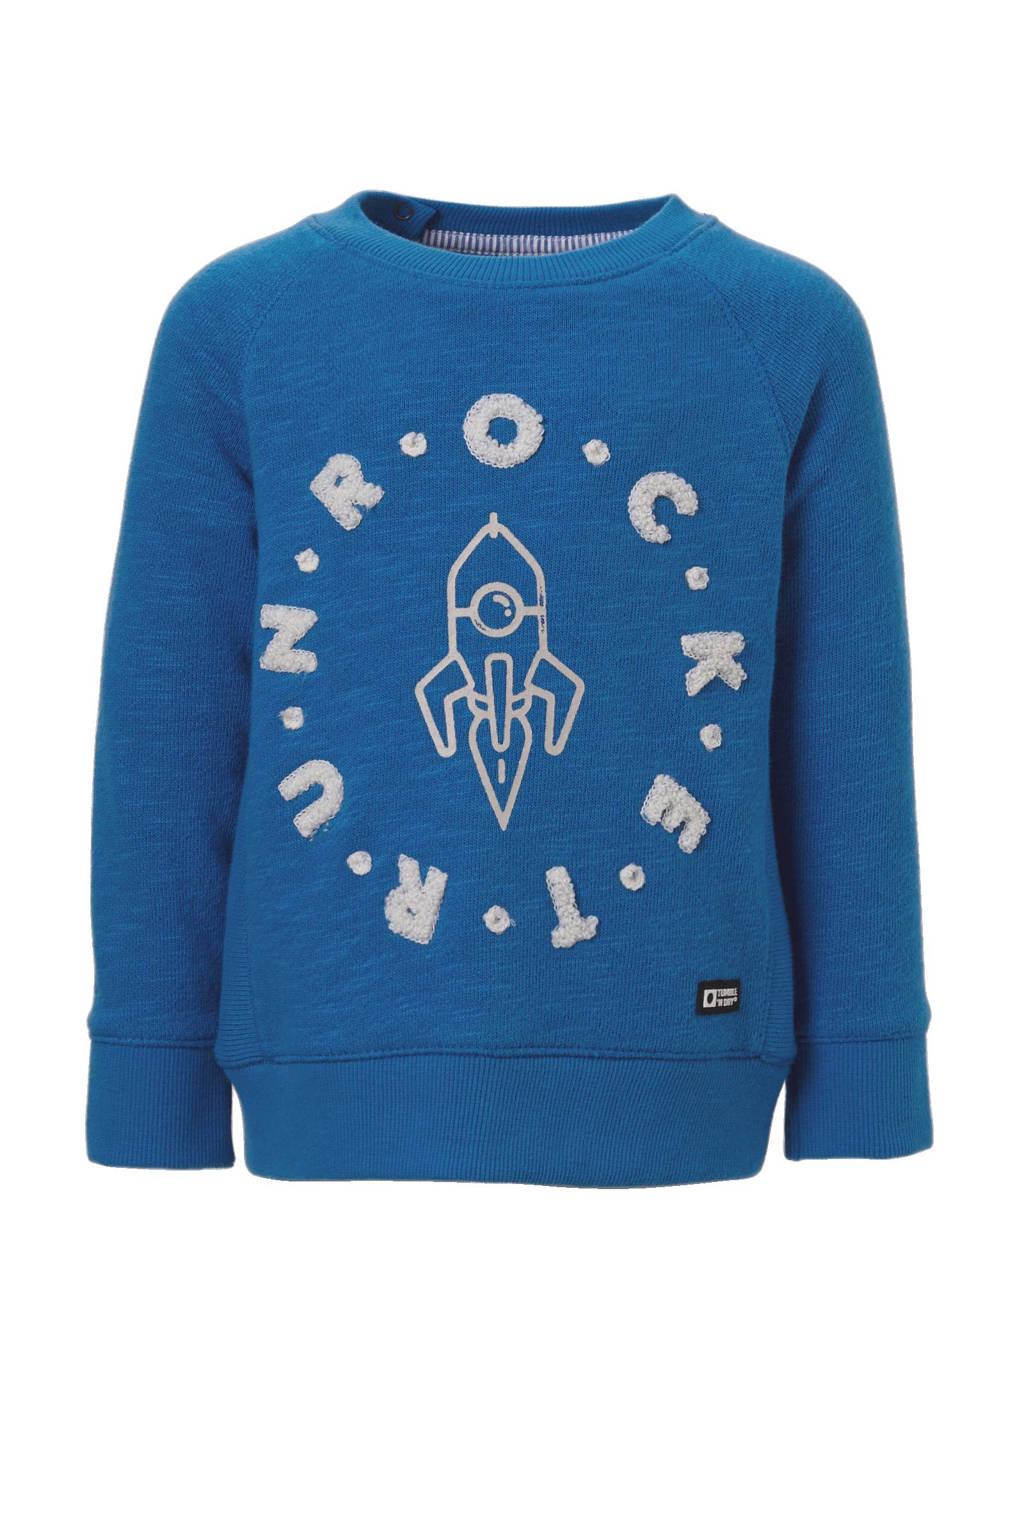 Tumble 'n Dry Lo sweater Kingsley blauw, Blauw/wit